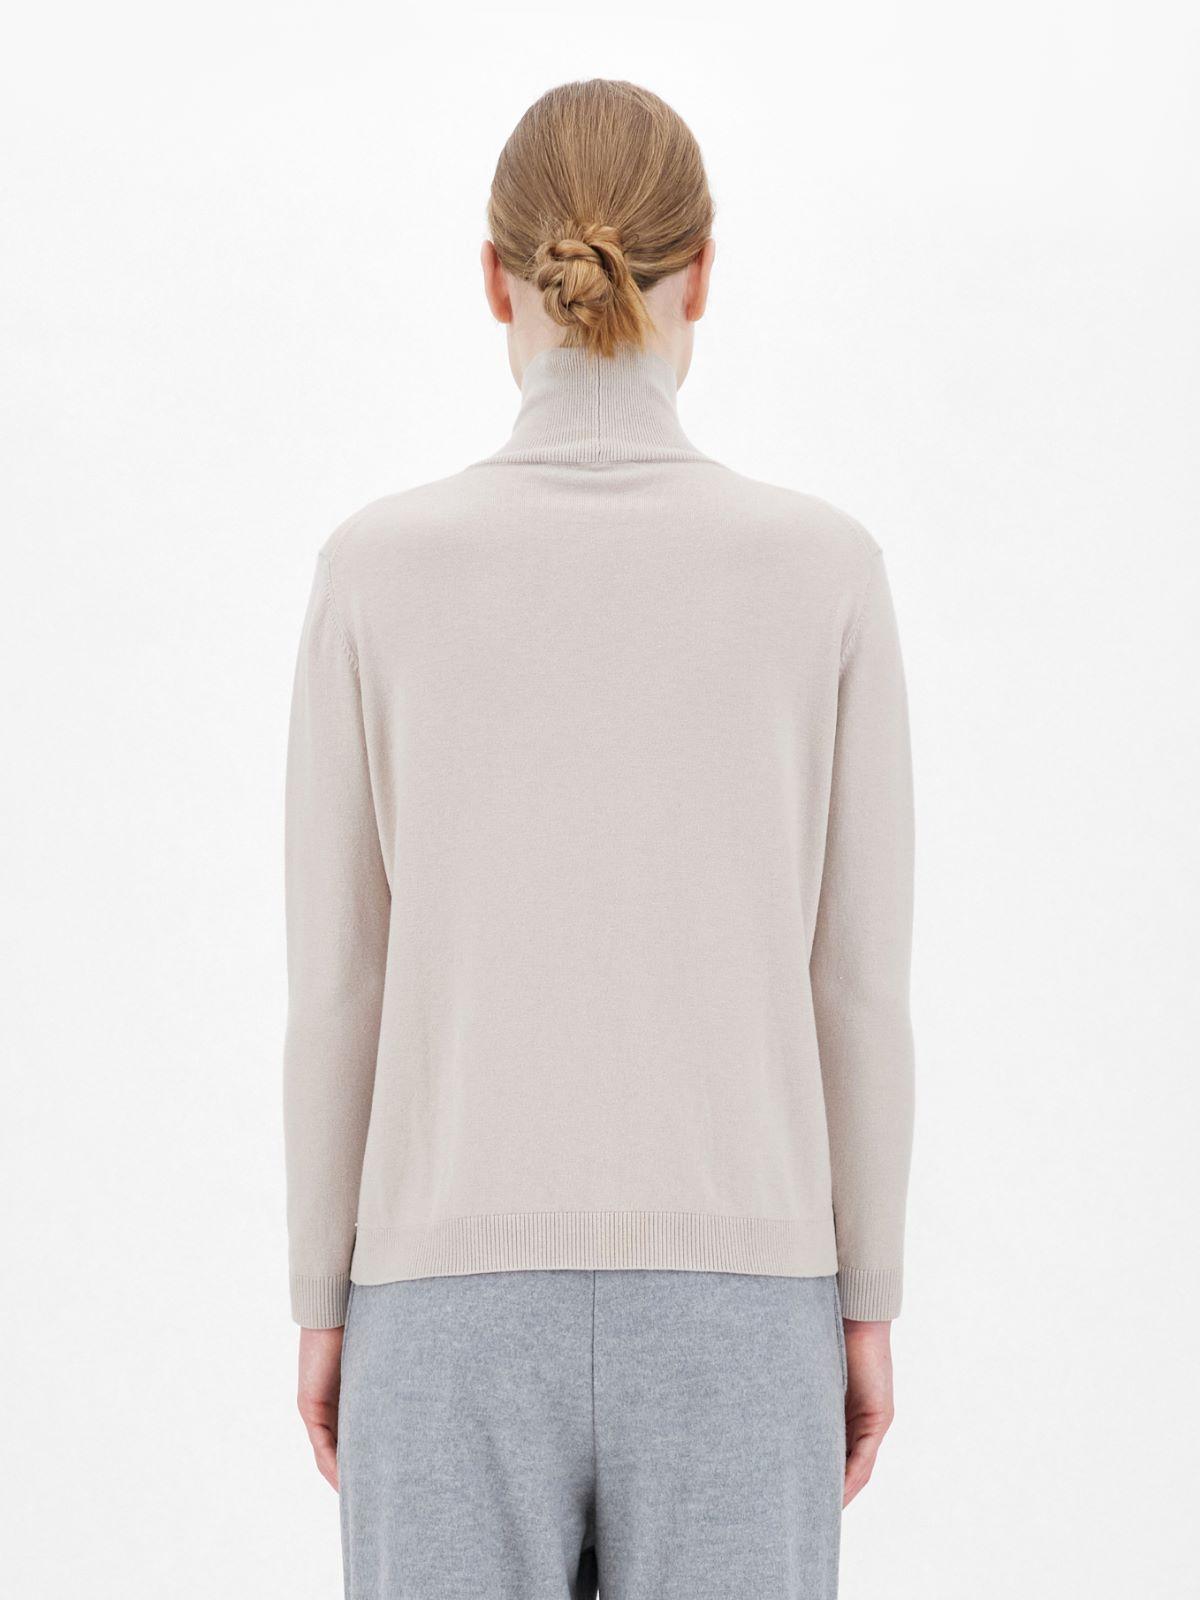 Silk and wool yarn sweater Weekend Maxmara